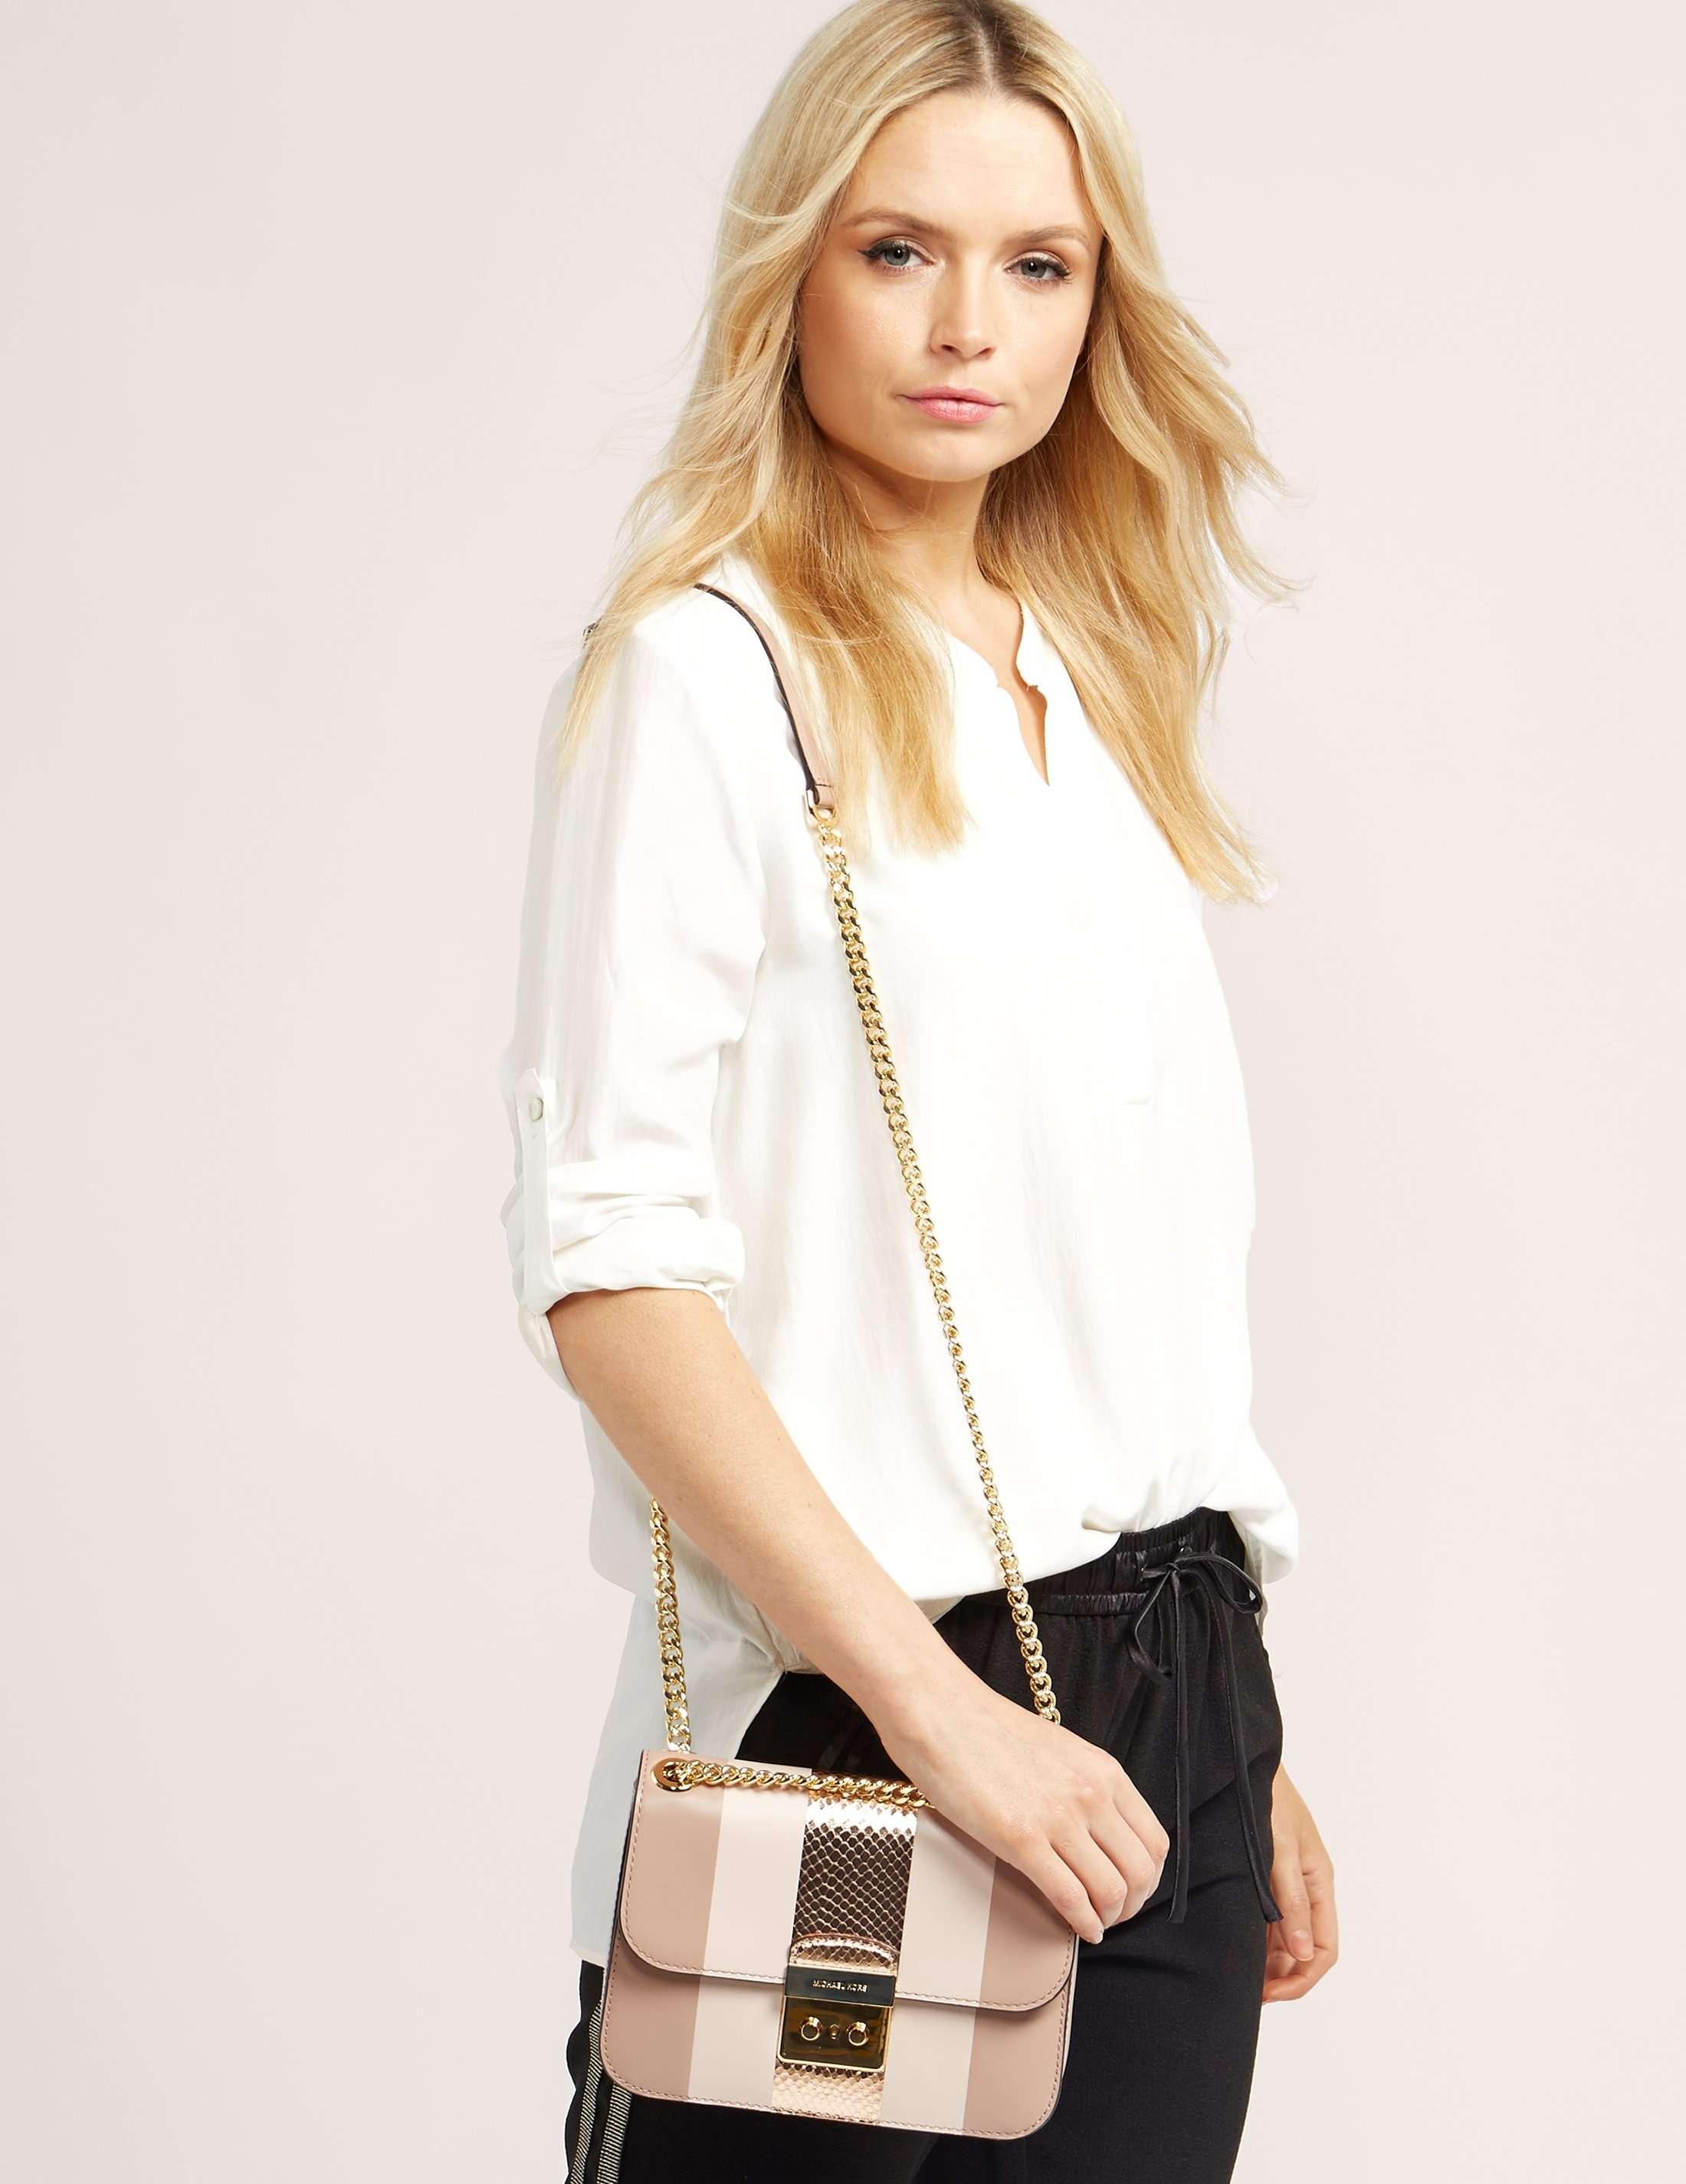 Michael Kors Sloan Editor Medium Shoulder Bag